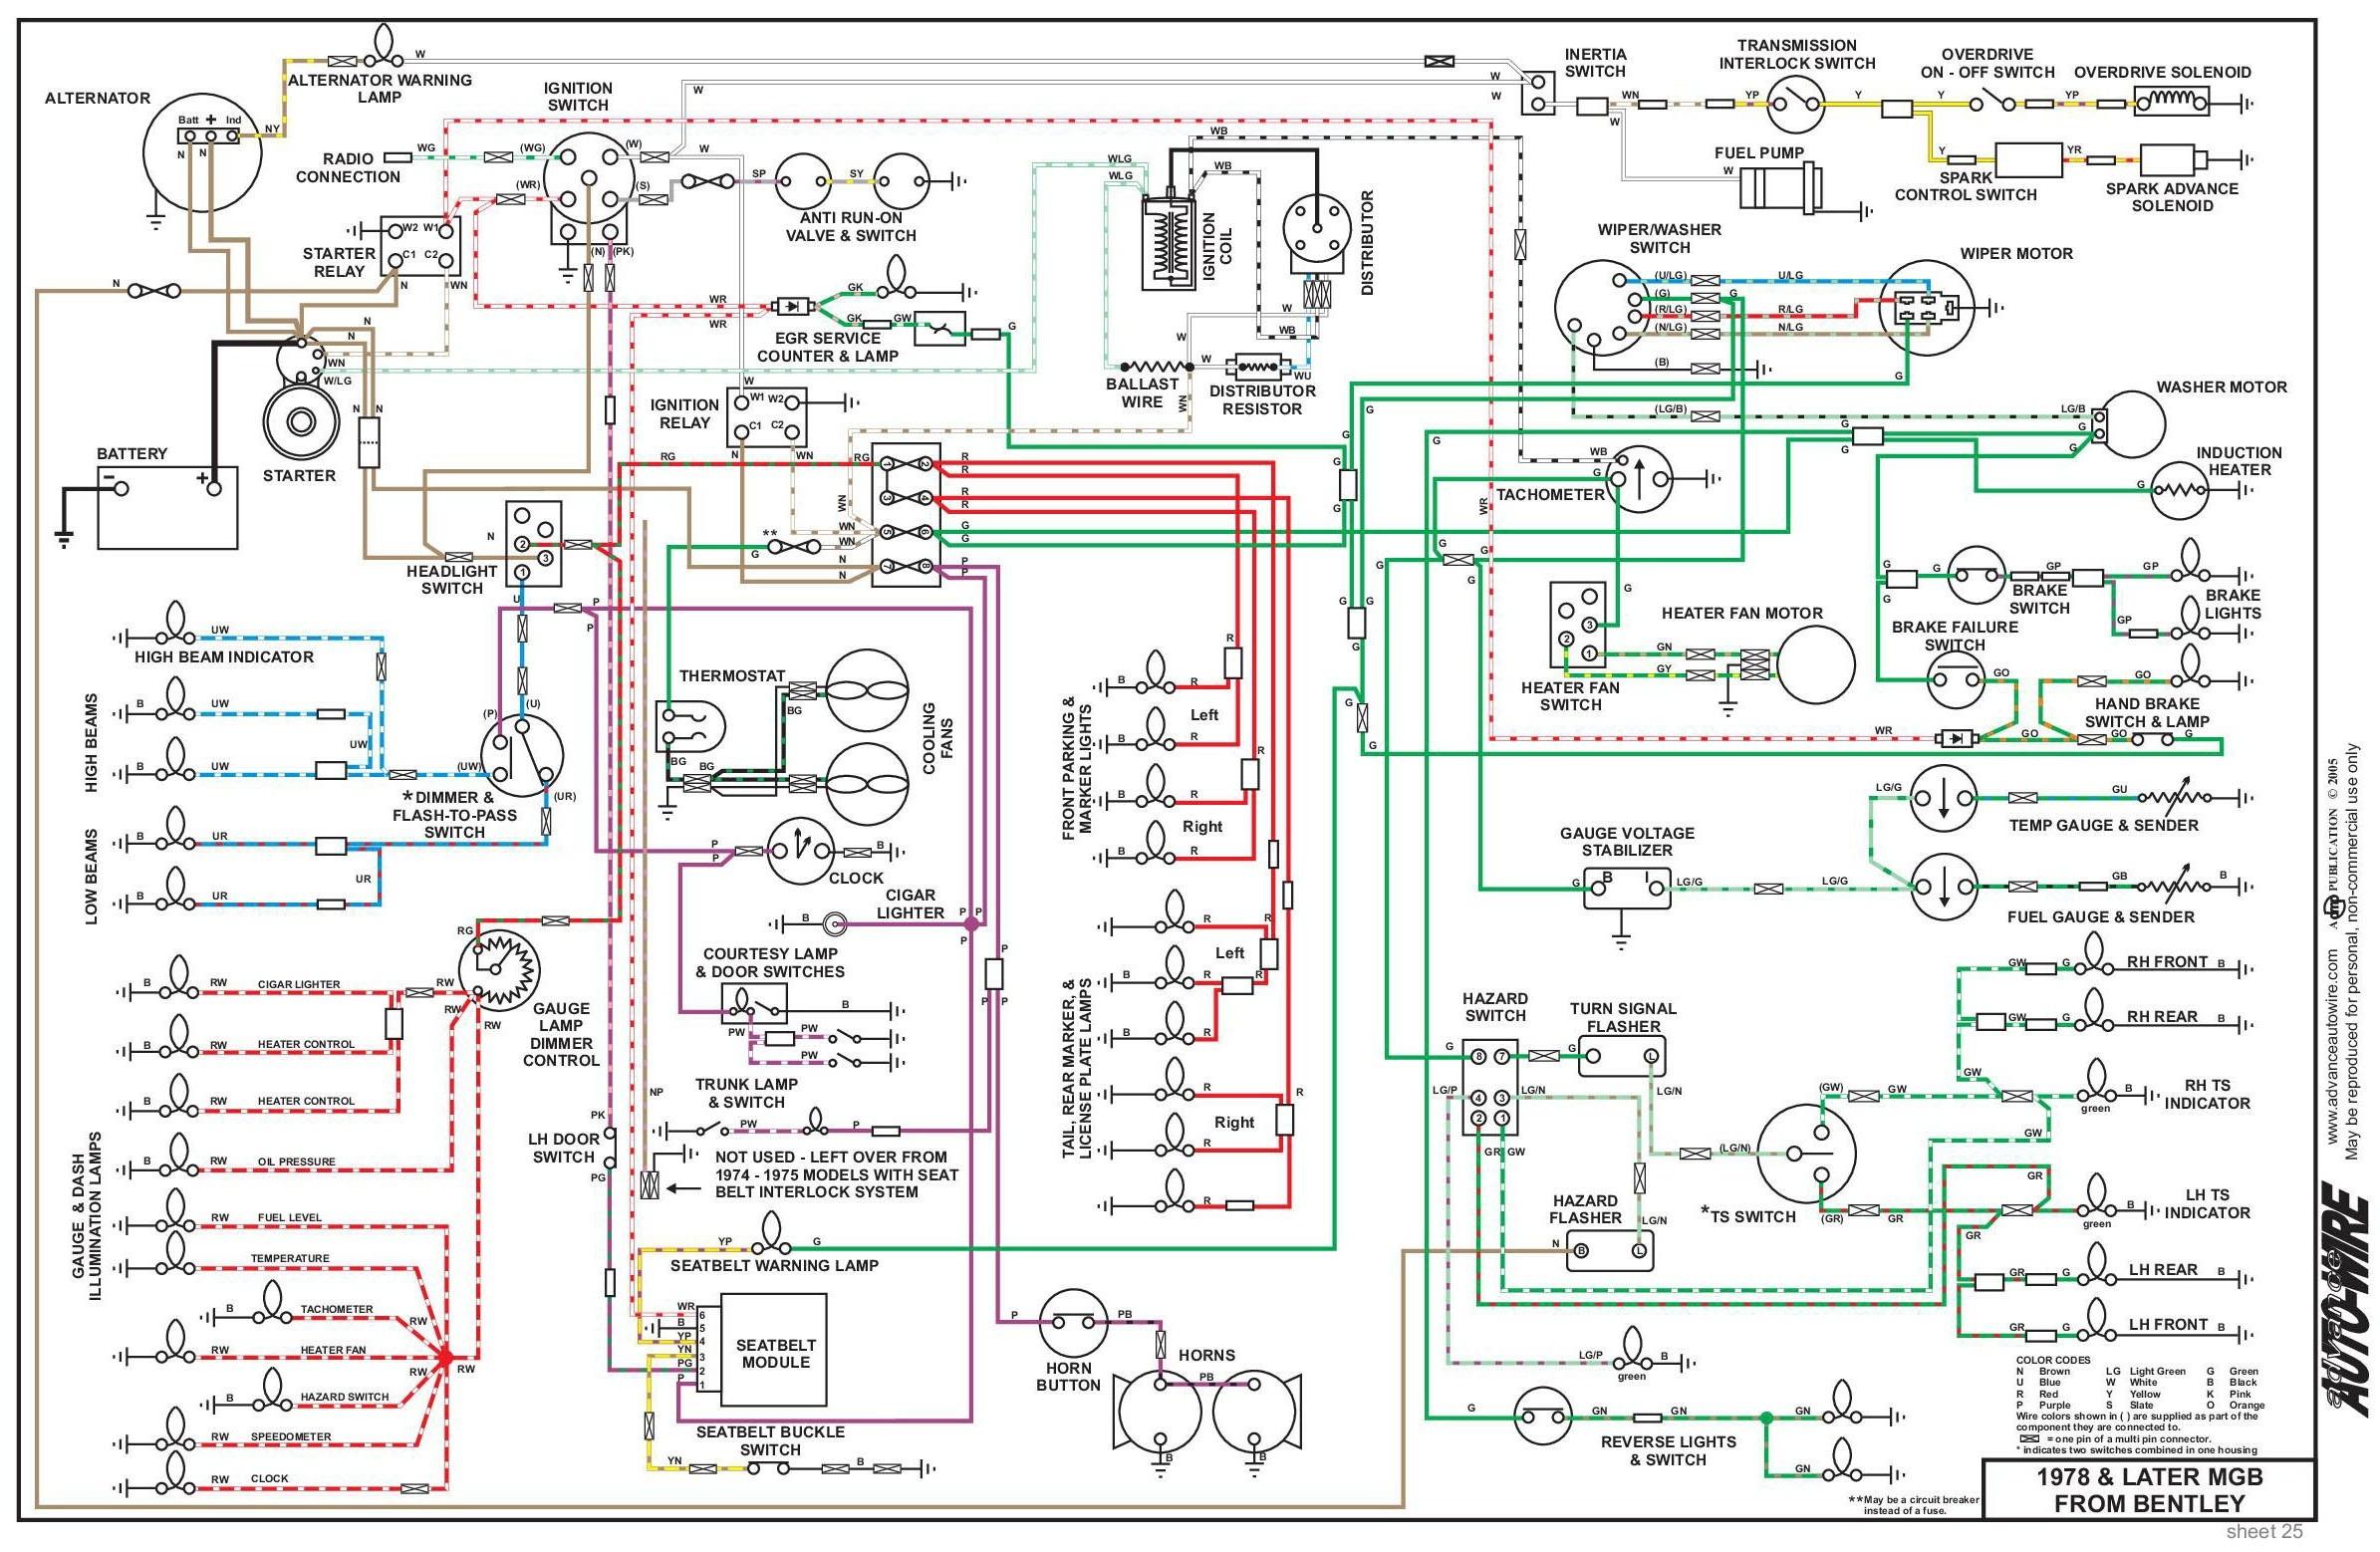 1976 mgb wiring diagram od wire center u2022 rh 144 202 77 77 Chevy 2 8L Engine Chevy 2 8L Engine